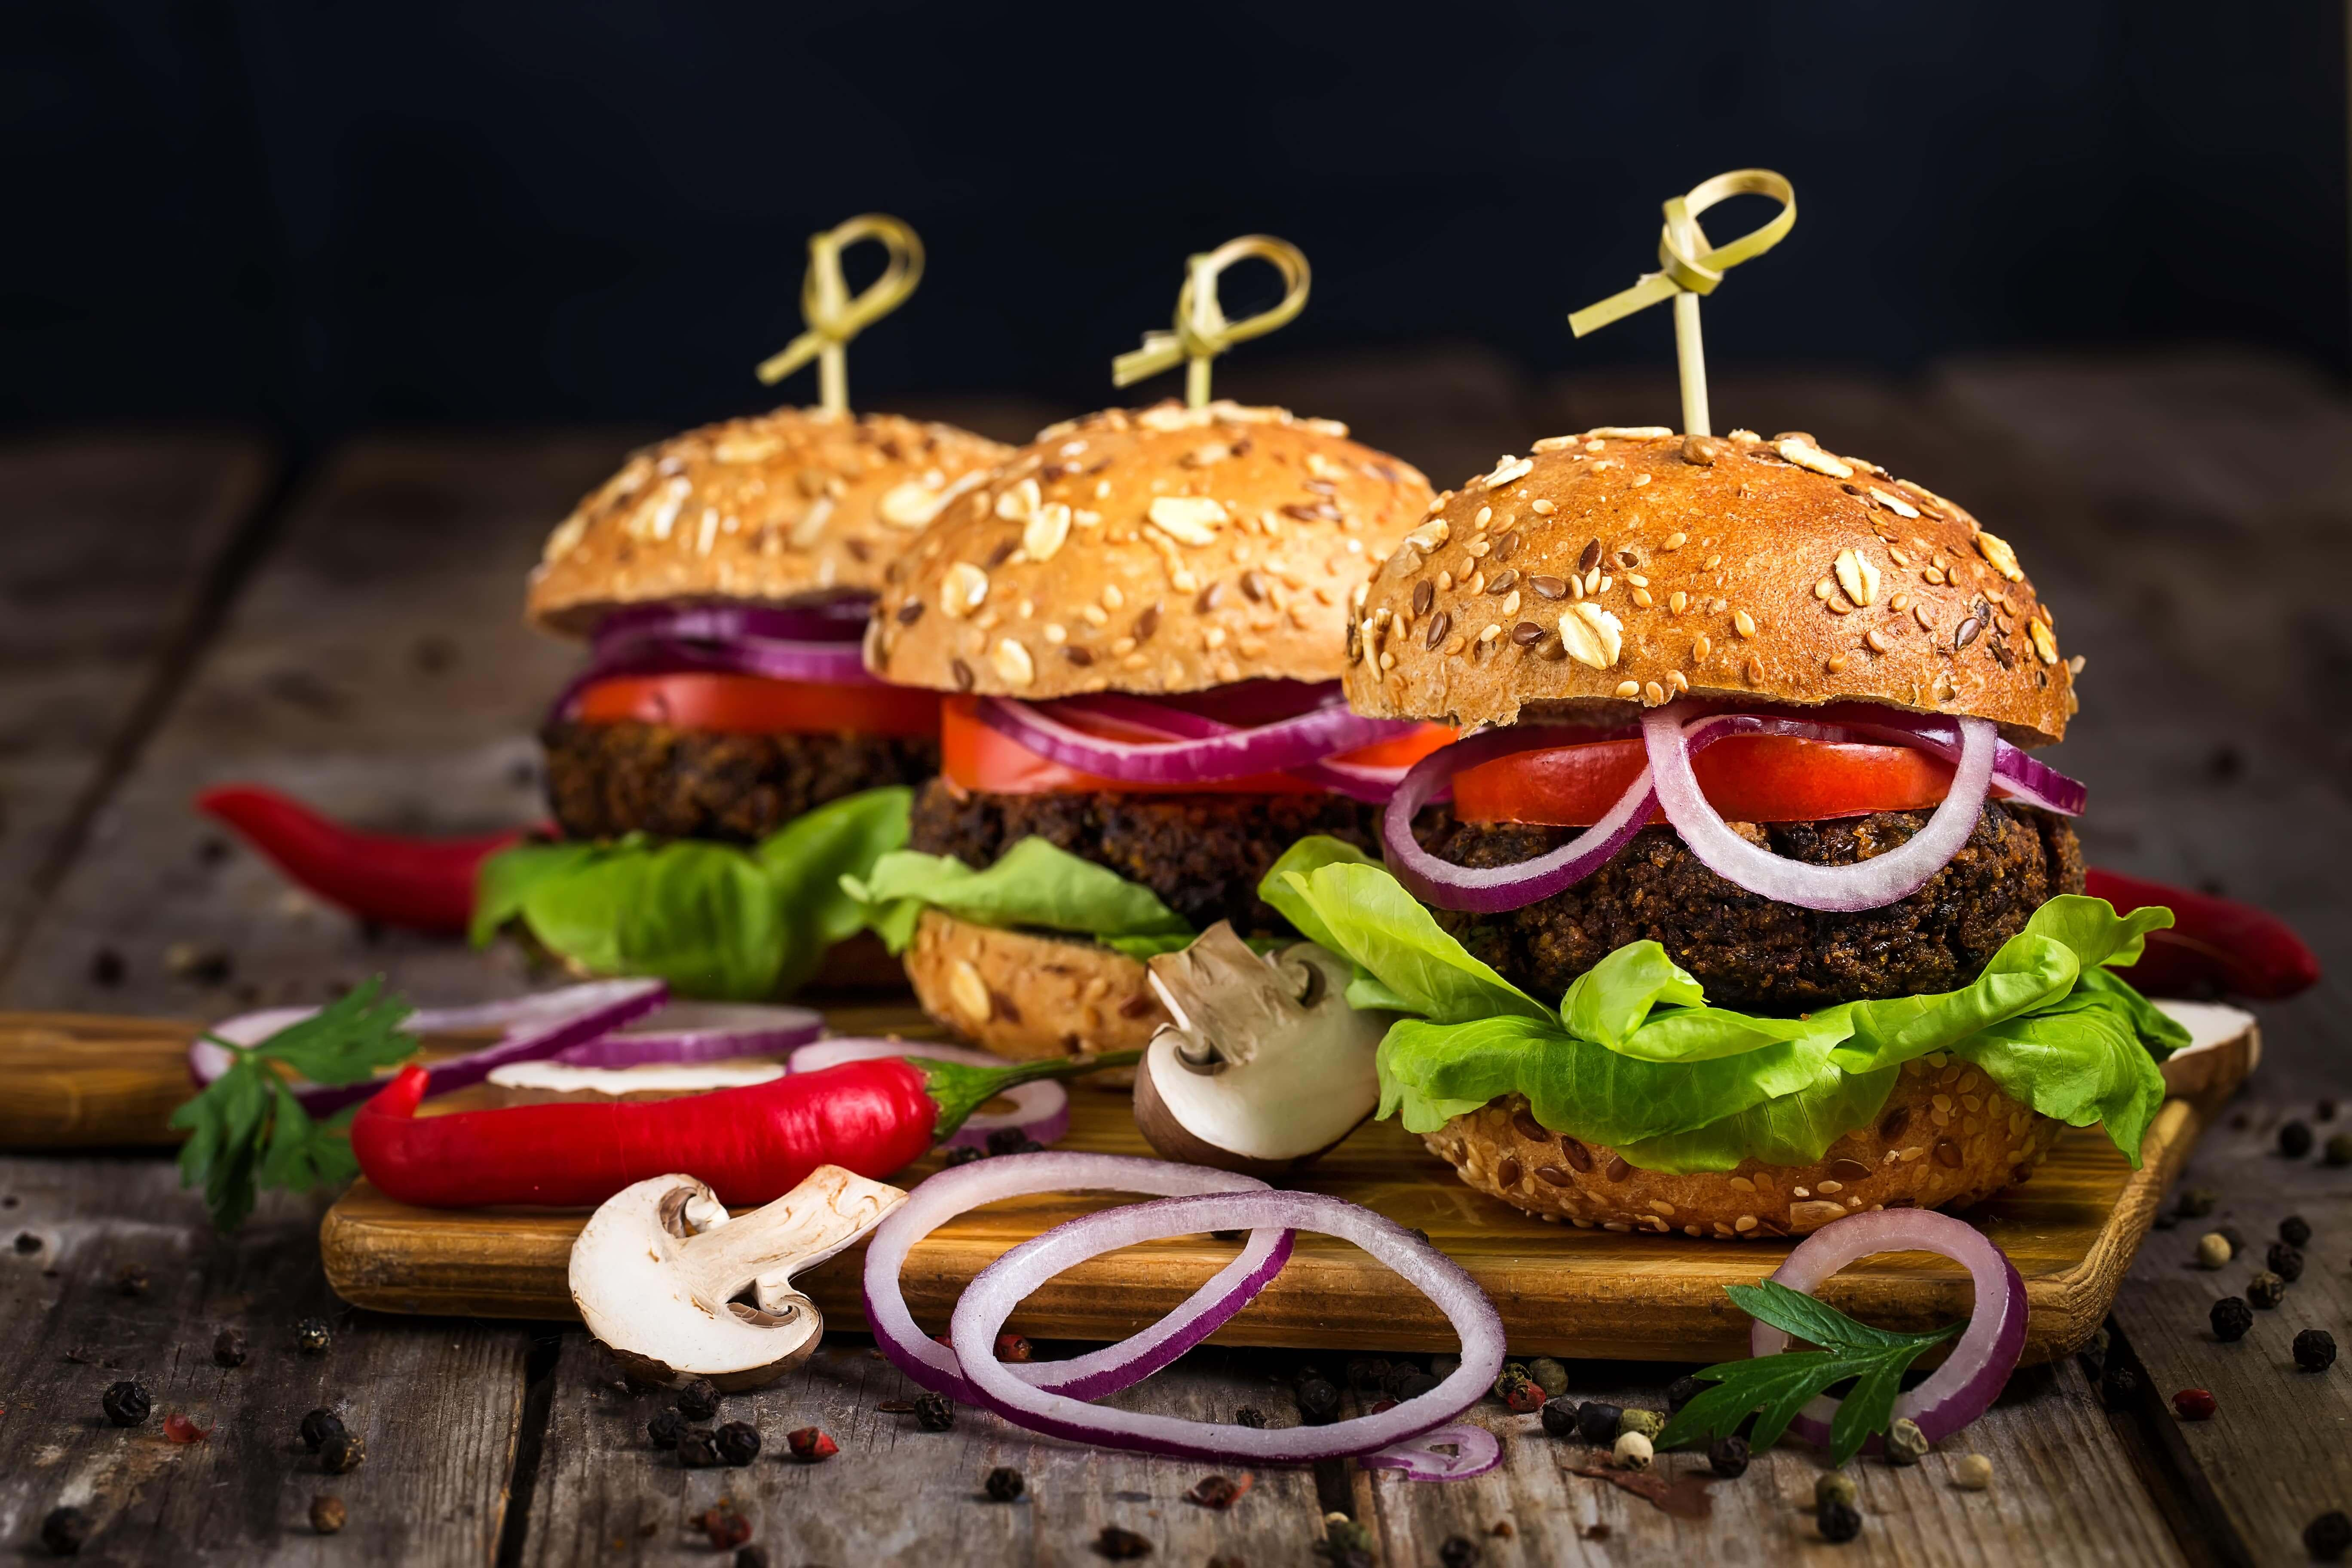 Nestlé Launches the Harvest Gourmet Incredible Burger